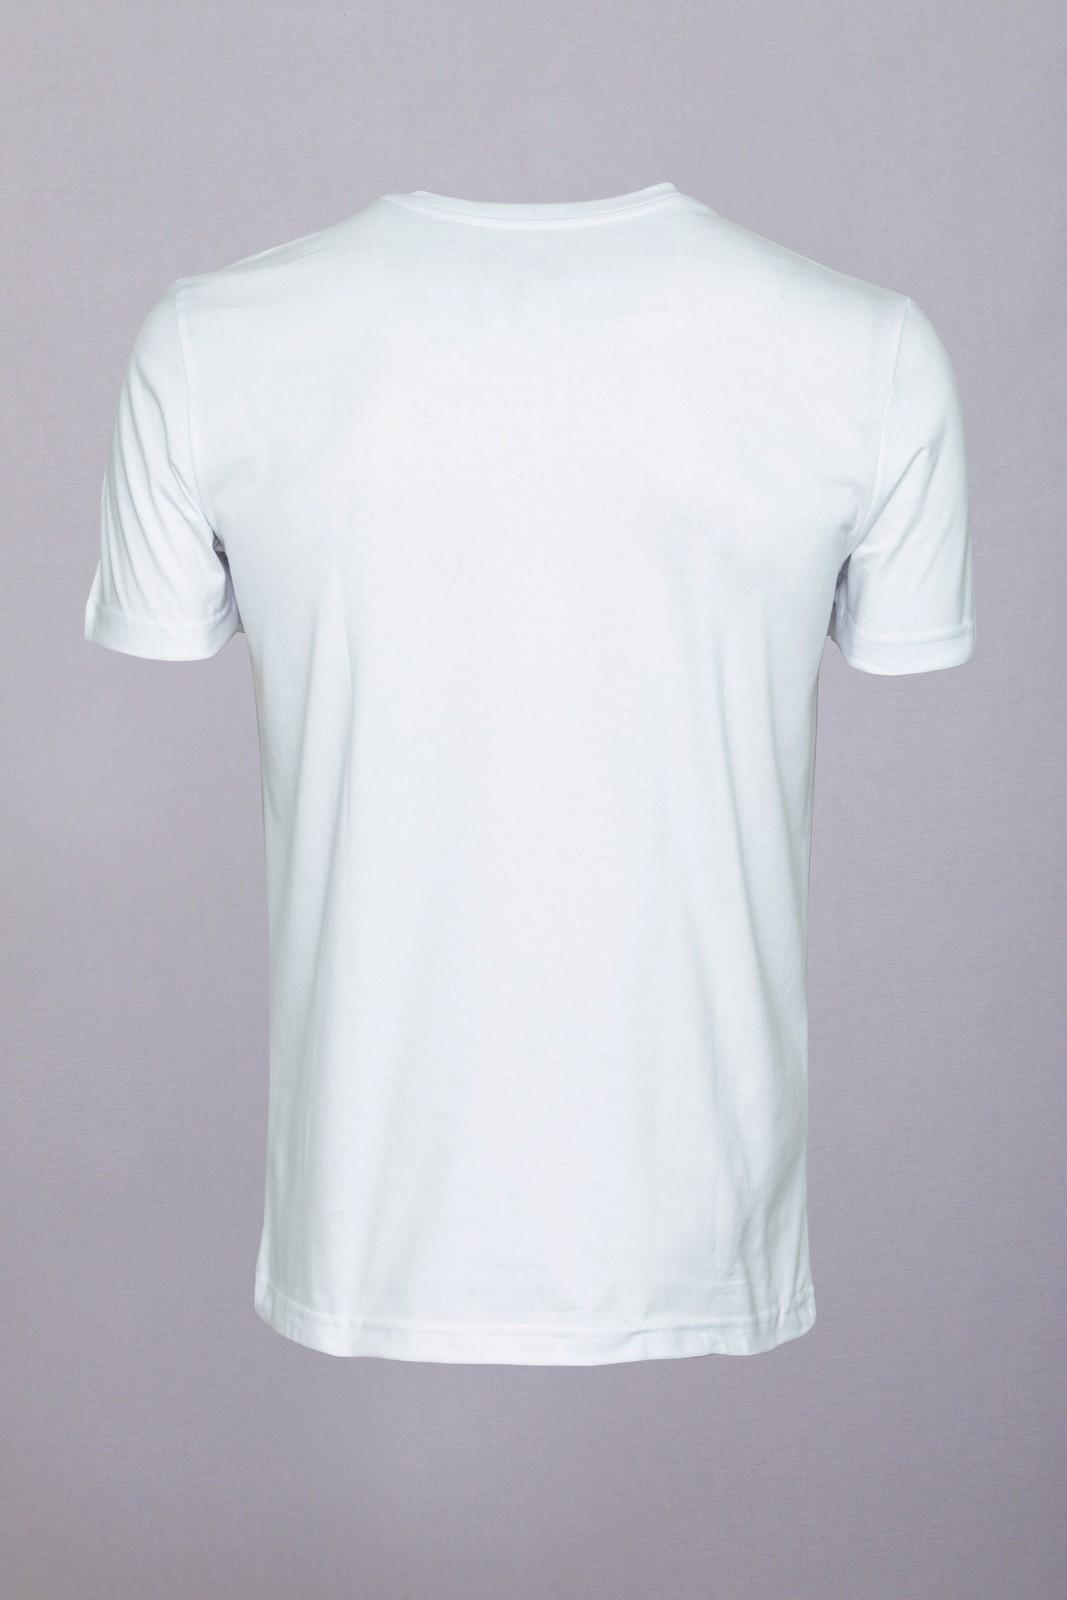 Camiseta CoolWave Concrete Waves Branca